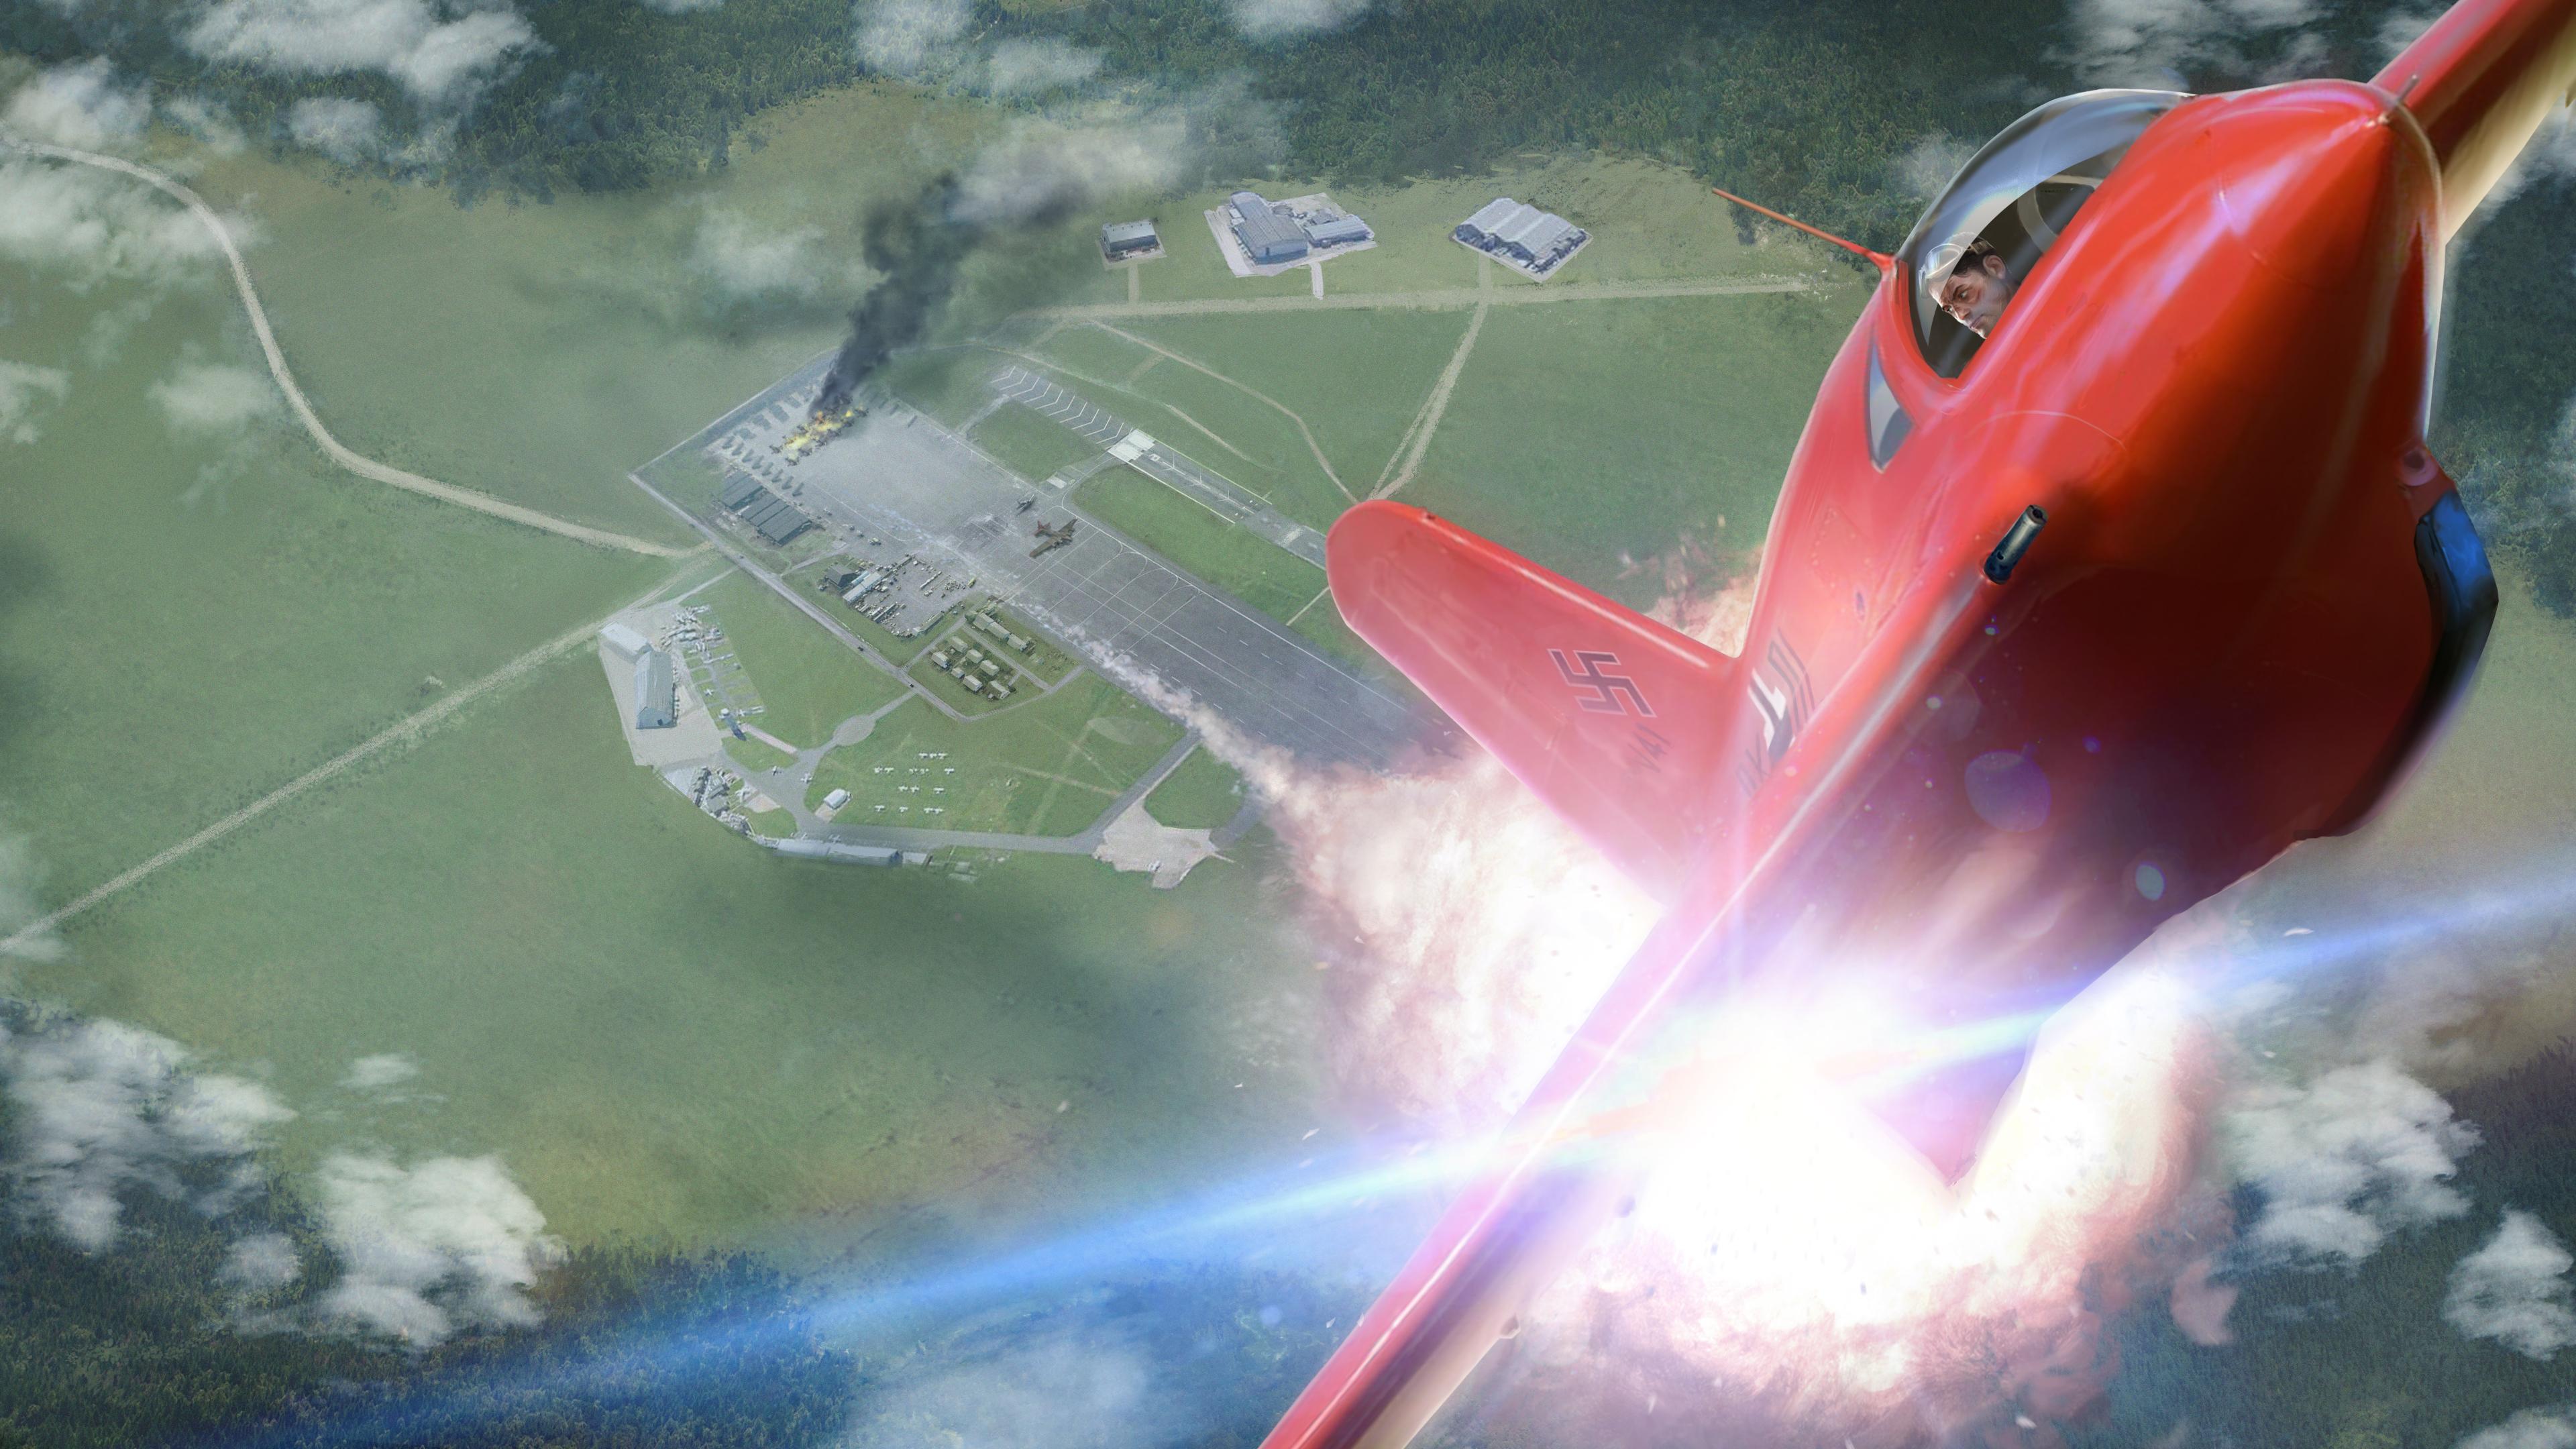 Me-163 mission